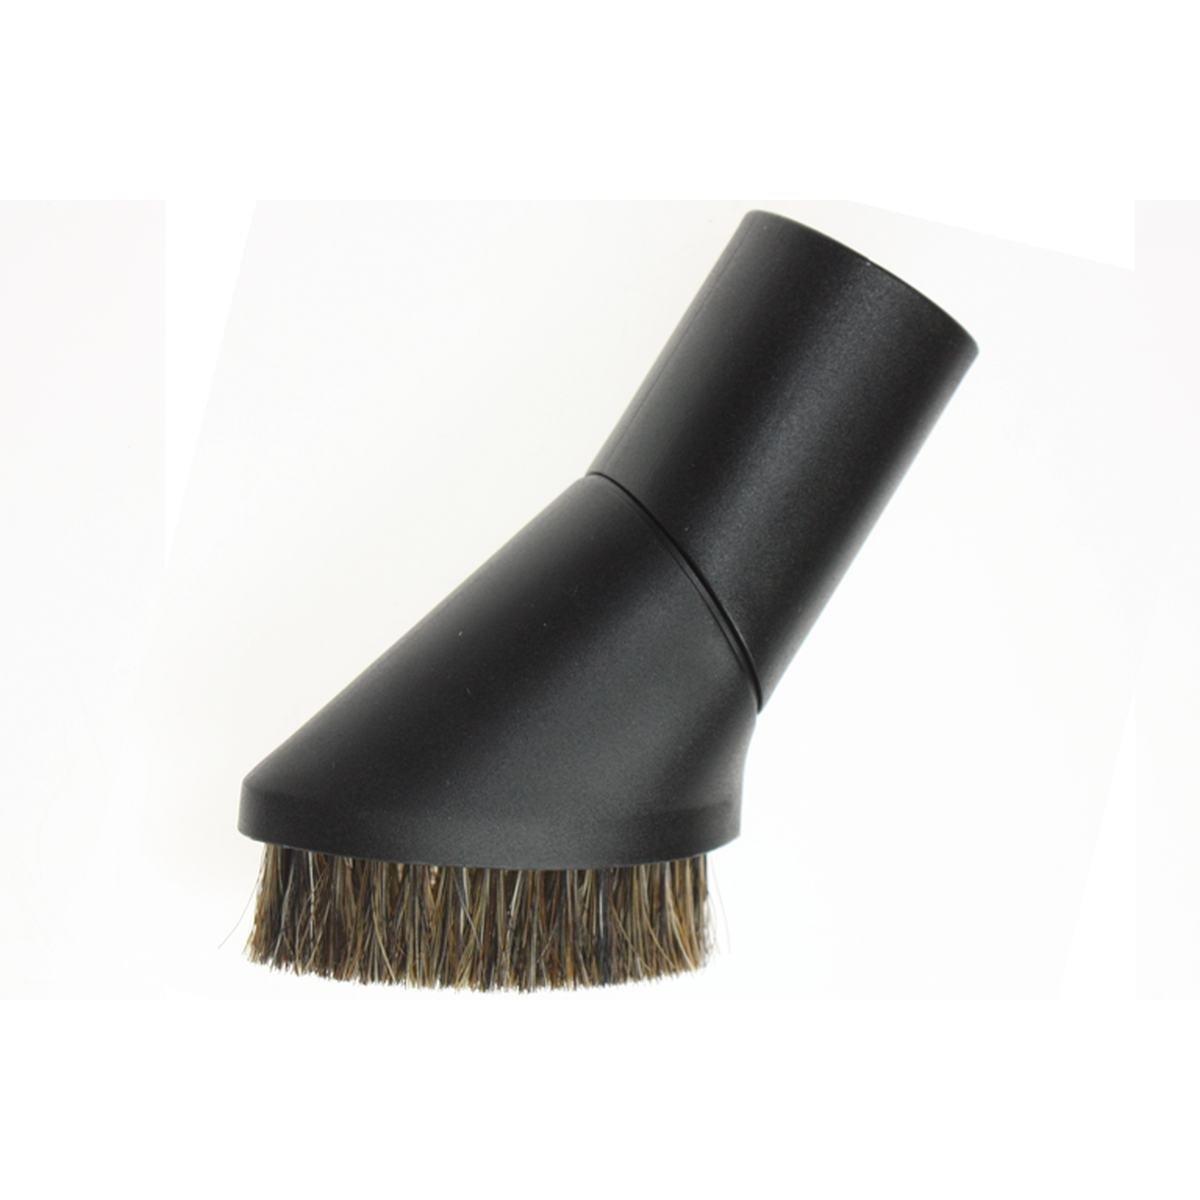 Møbelbørste bløde hår Ø32 mm.